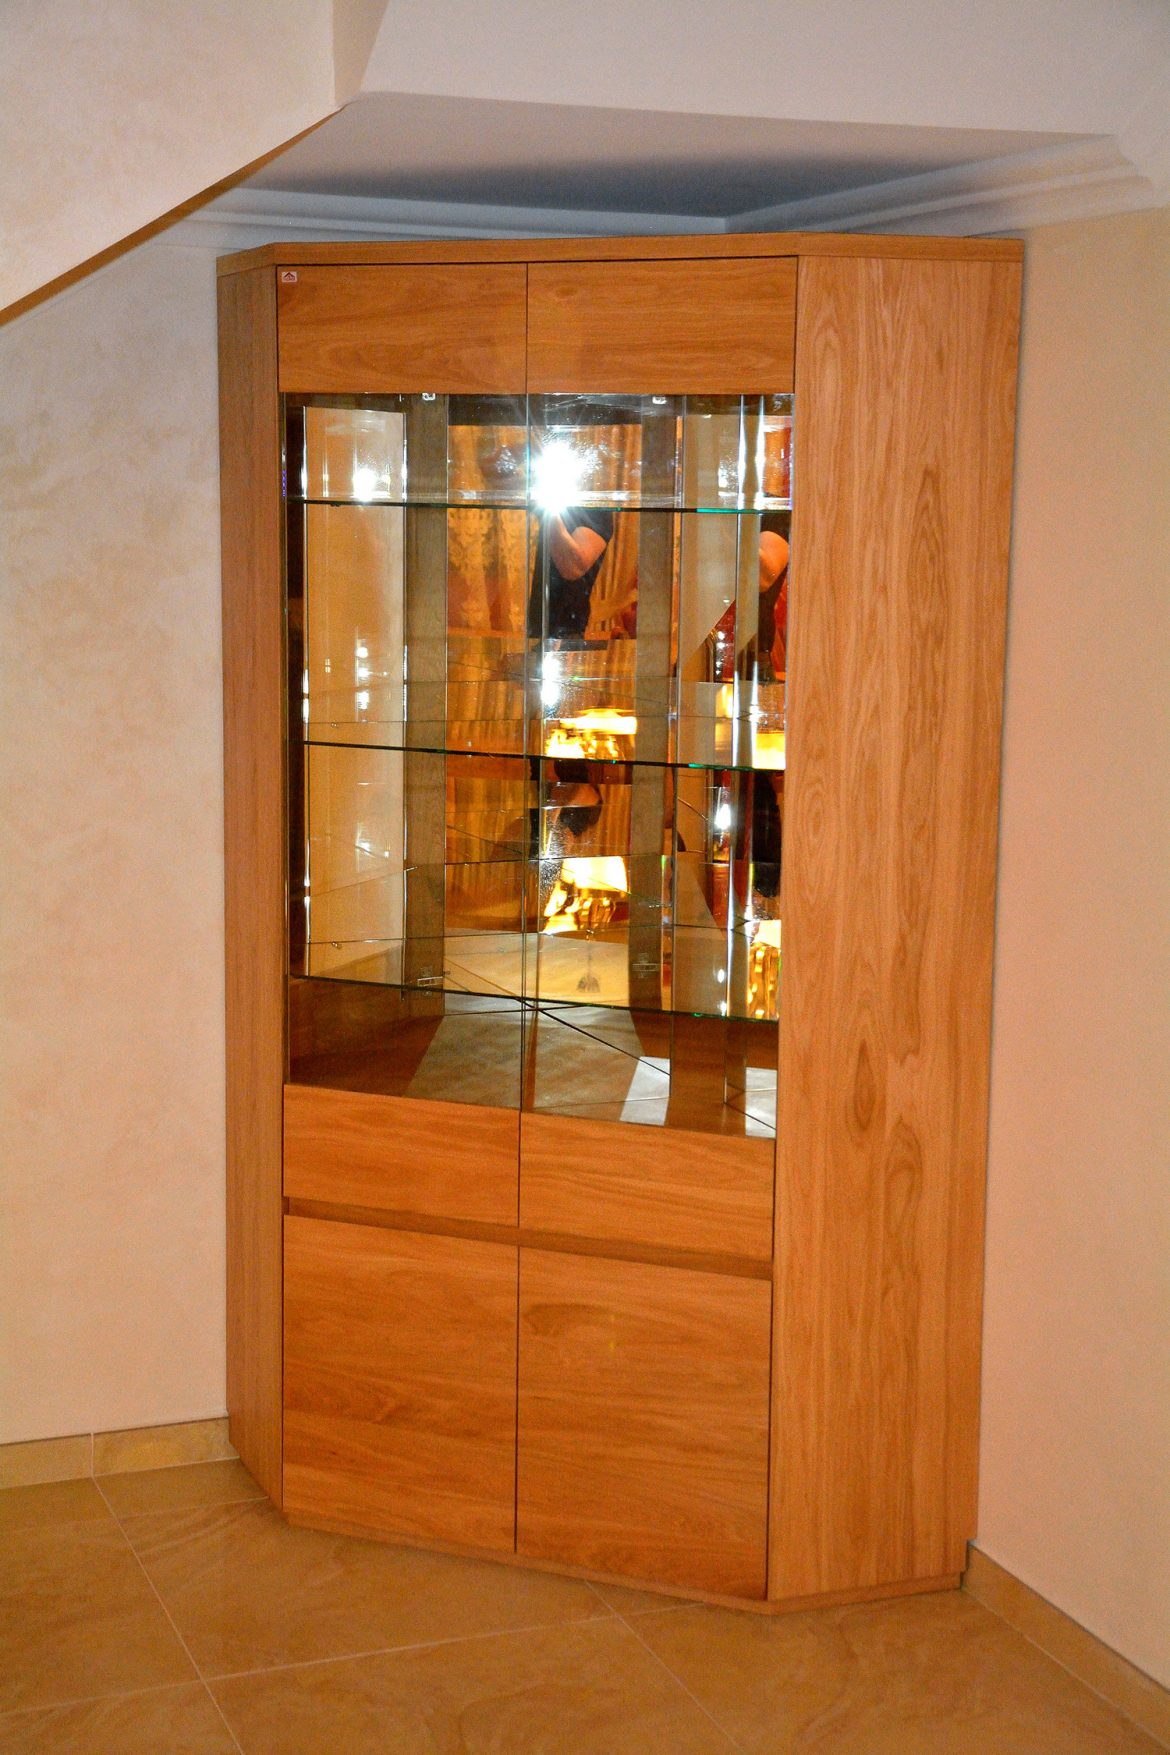 Vitrina realizata pe comanda din lemn masiv stejar natur cu polite interioare din sticla si banda led